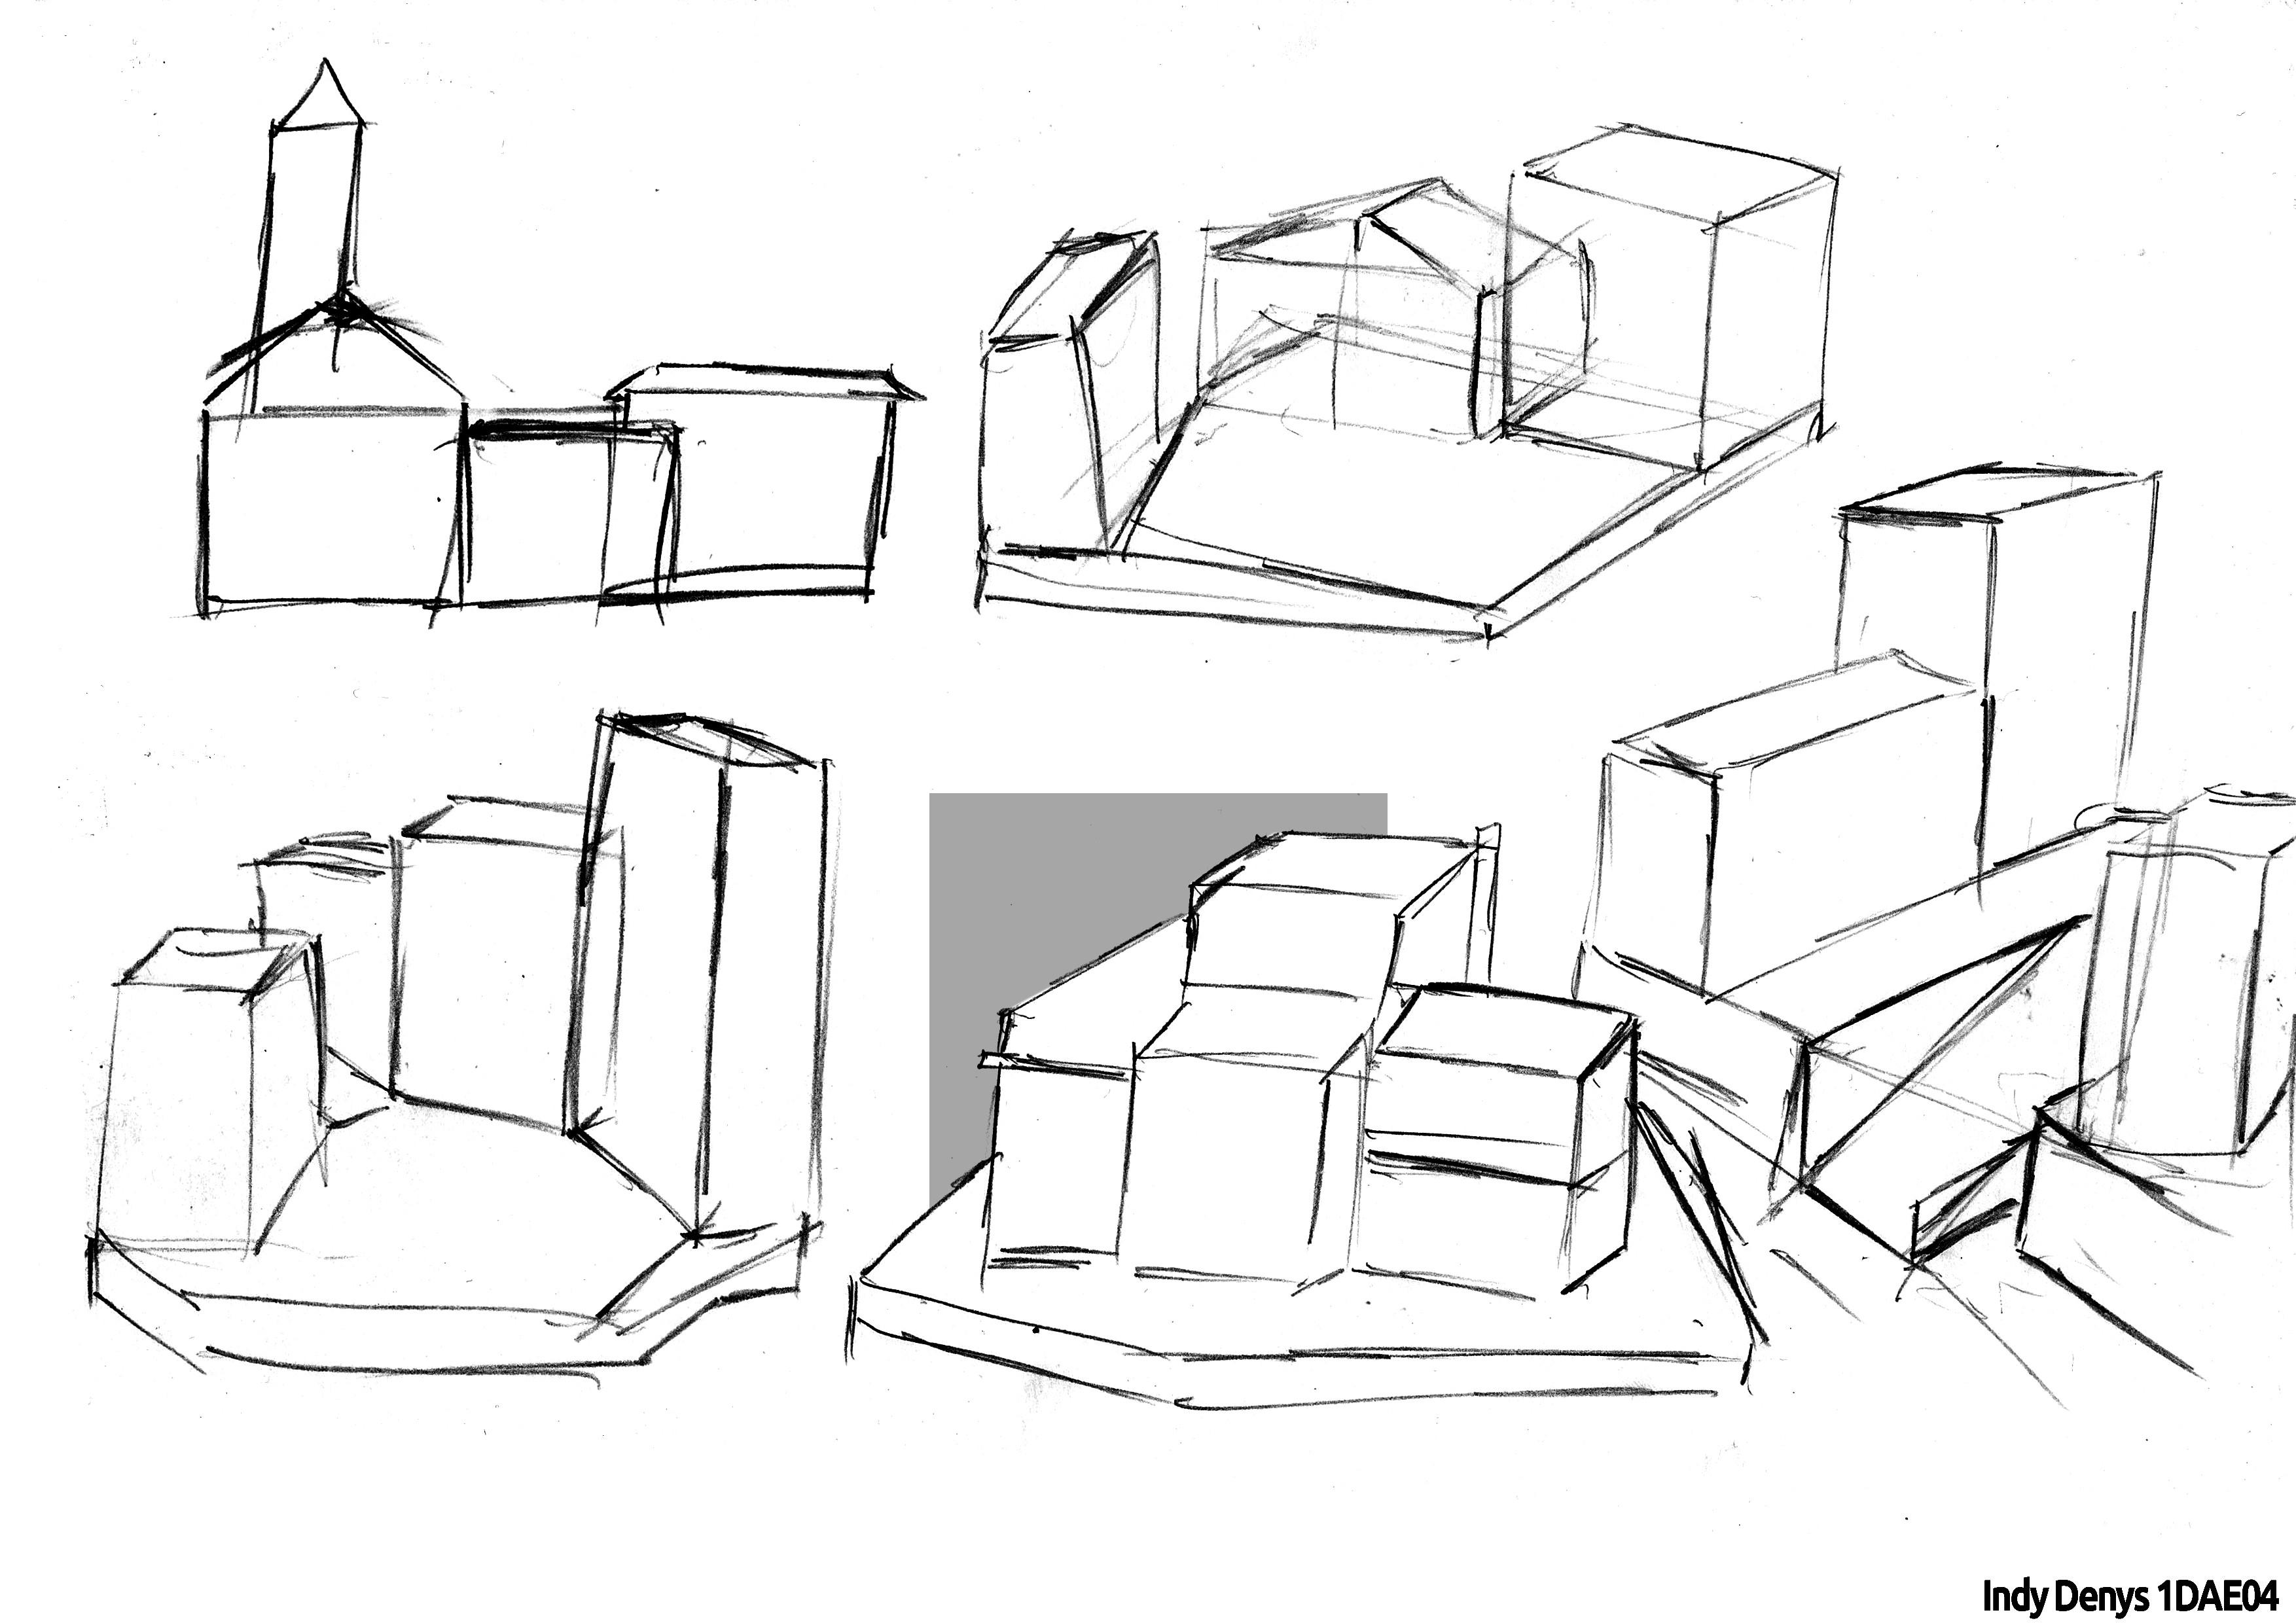 Silhoutte study - layout